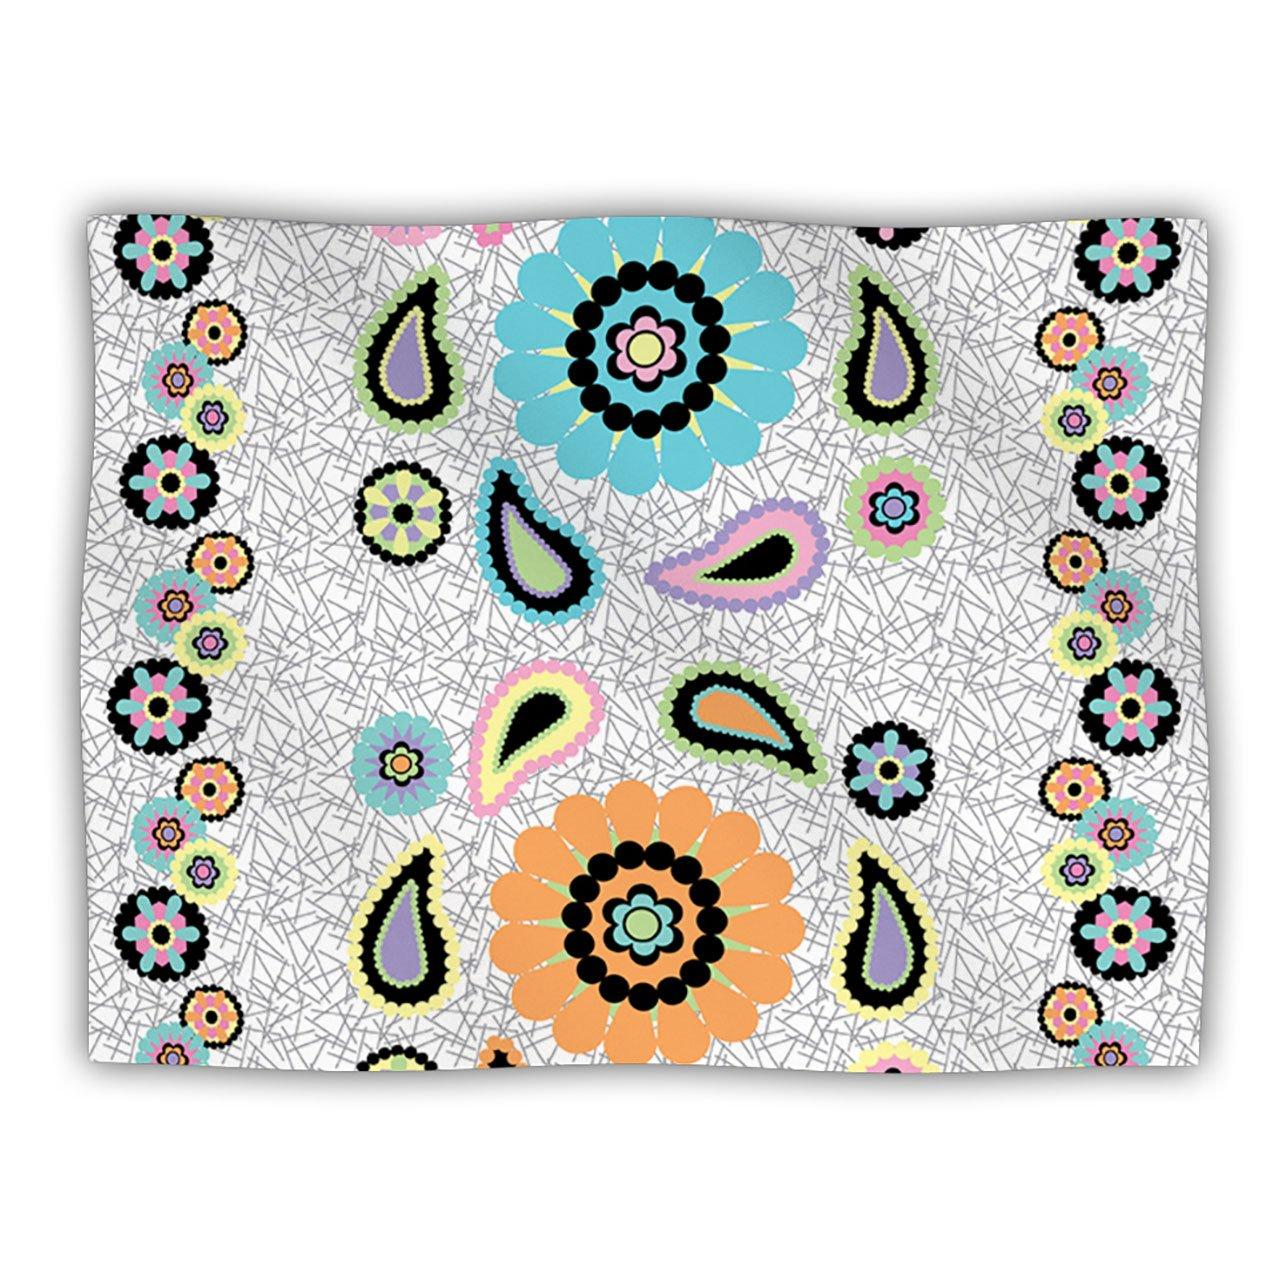 Kess InHouse Nina May ''Moda Paisley'' Paisley Flower Pet Dog Blanket, 60 by 50-Inch